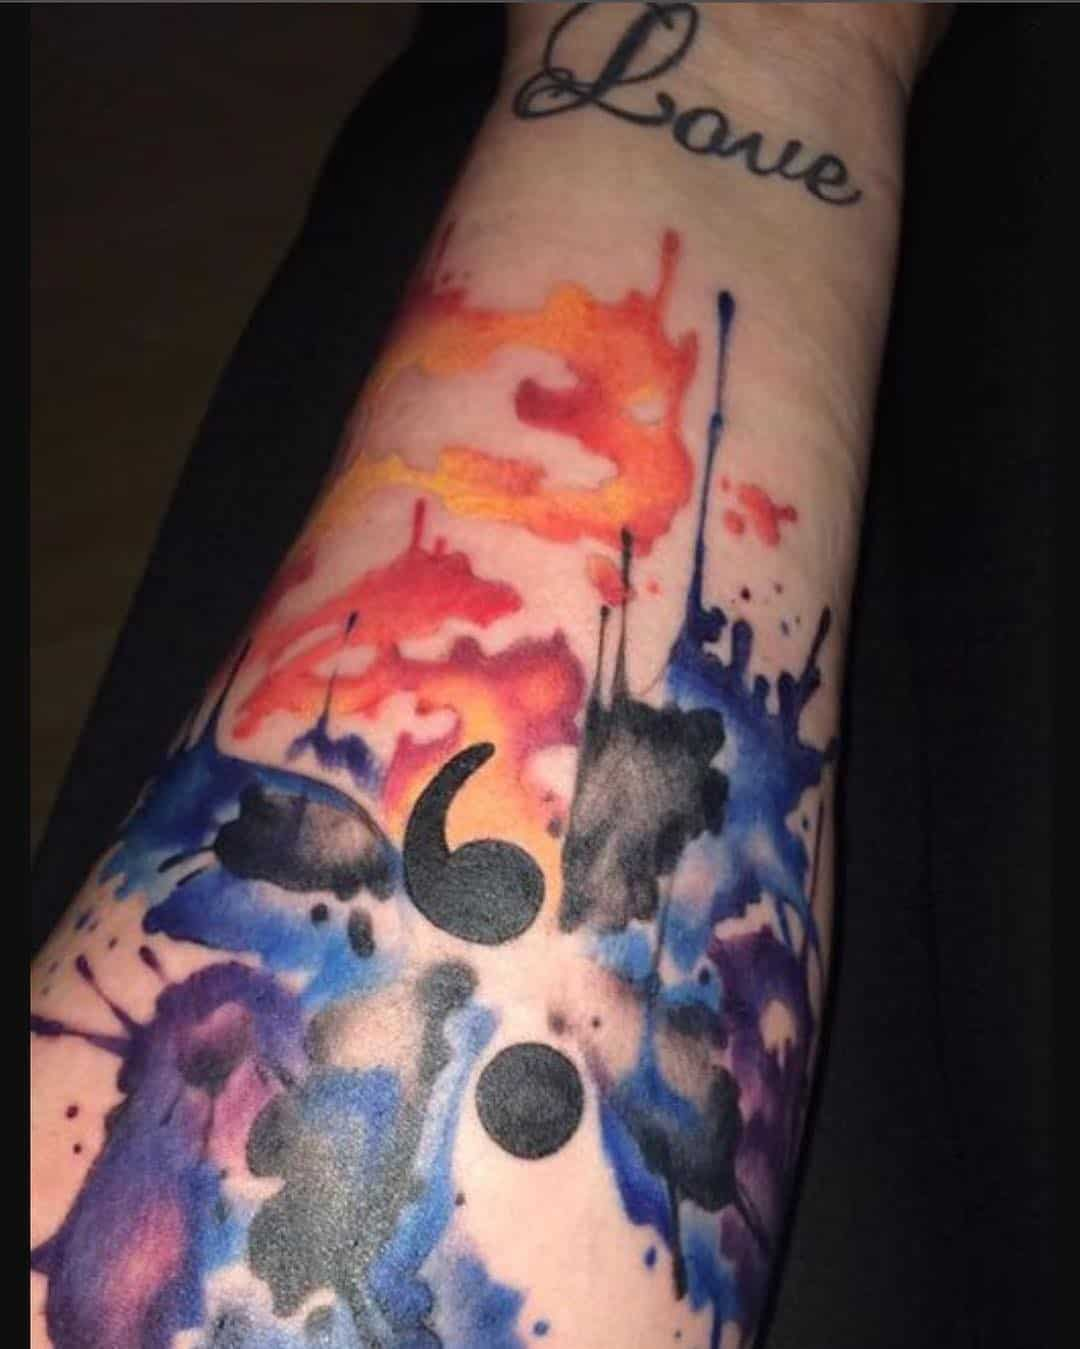 semicolon sleeve tattoo